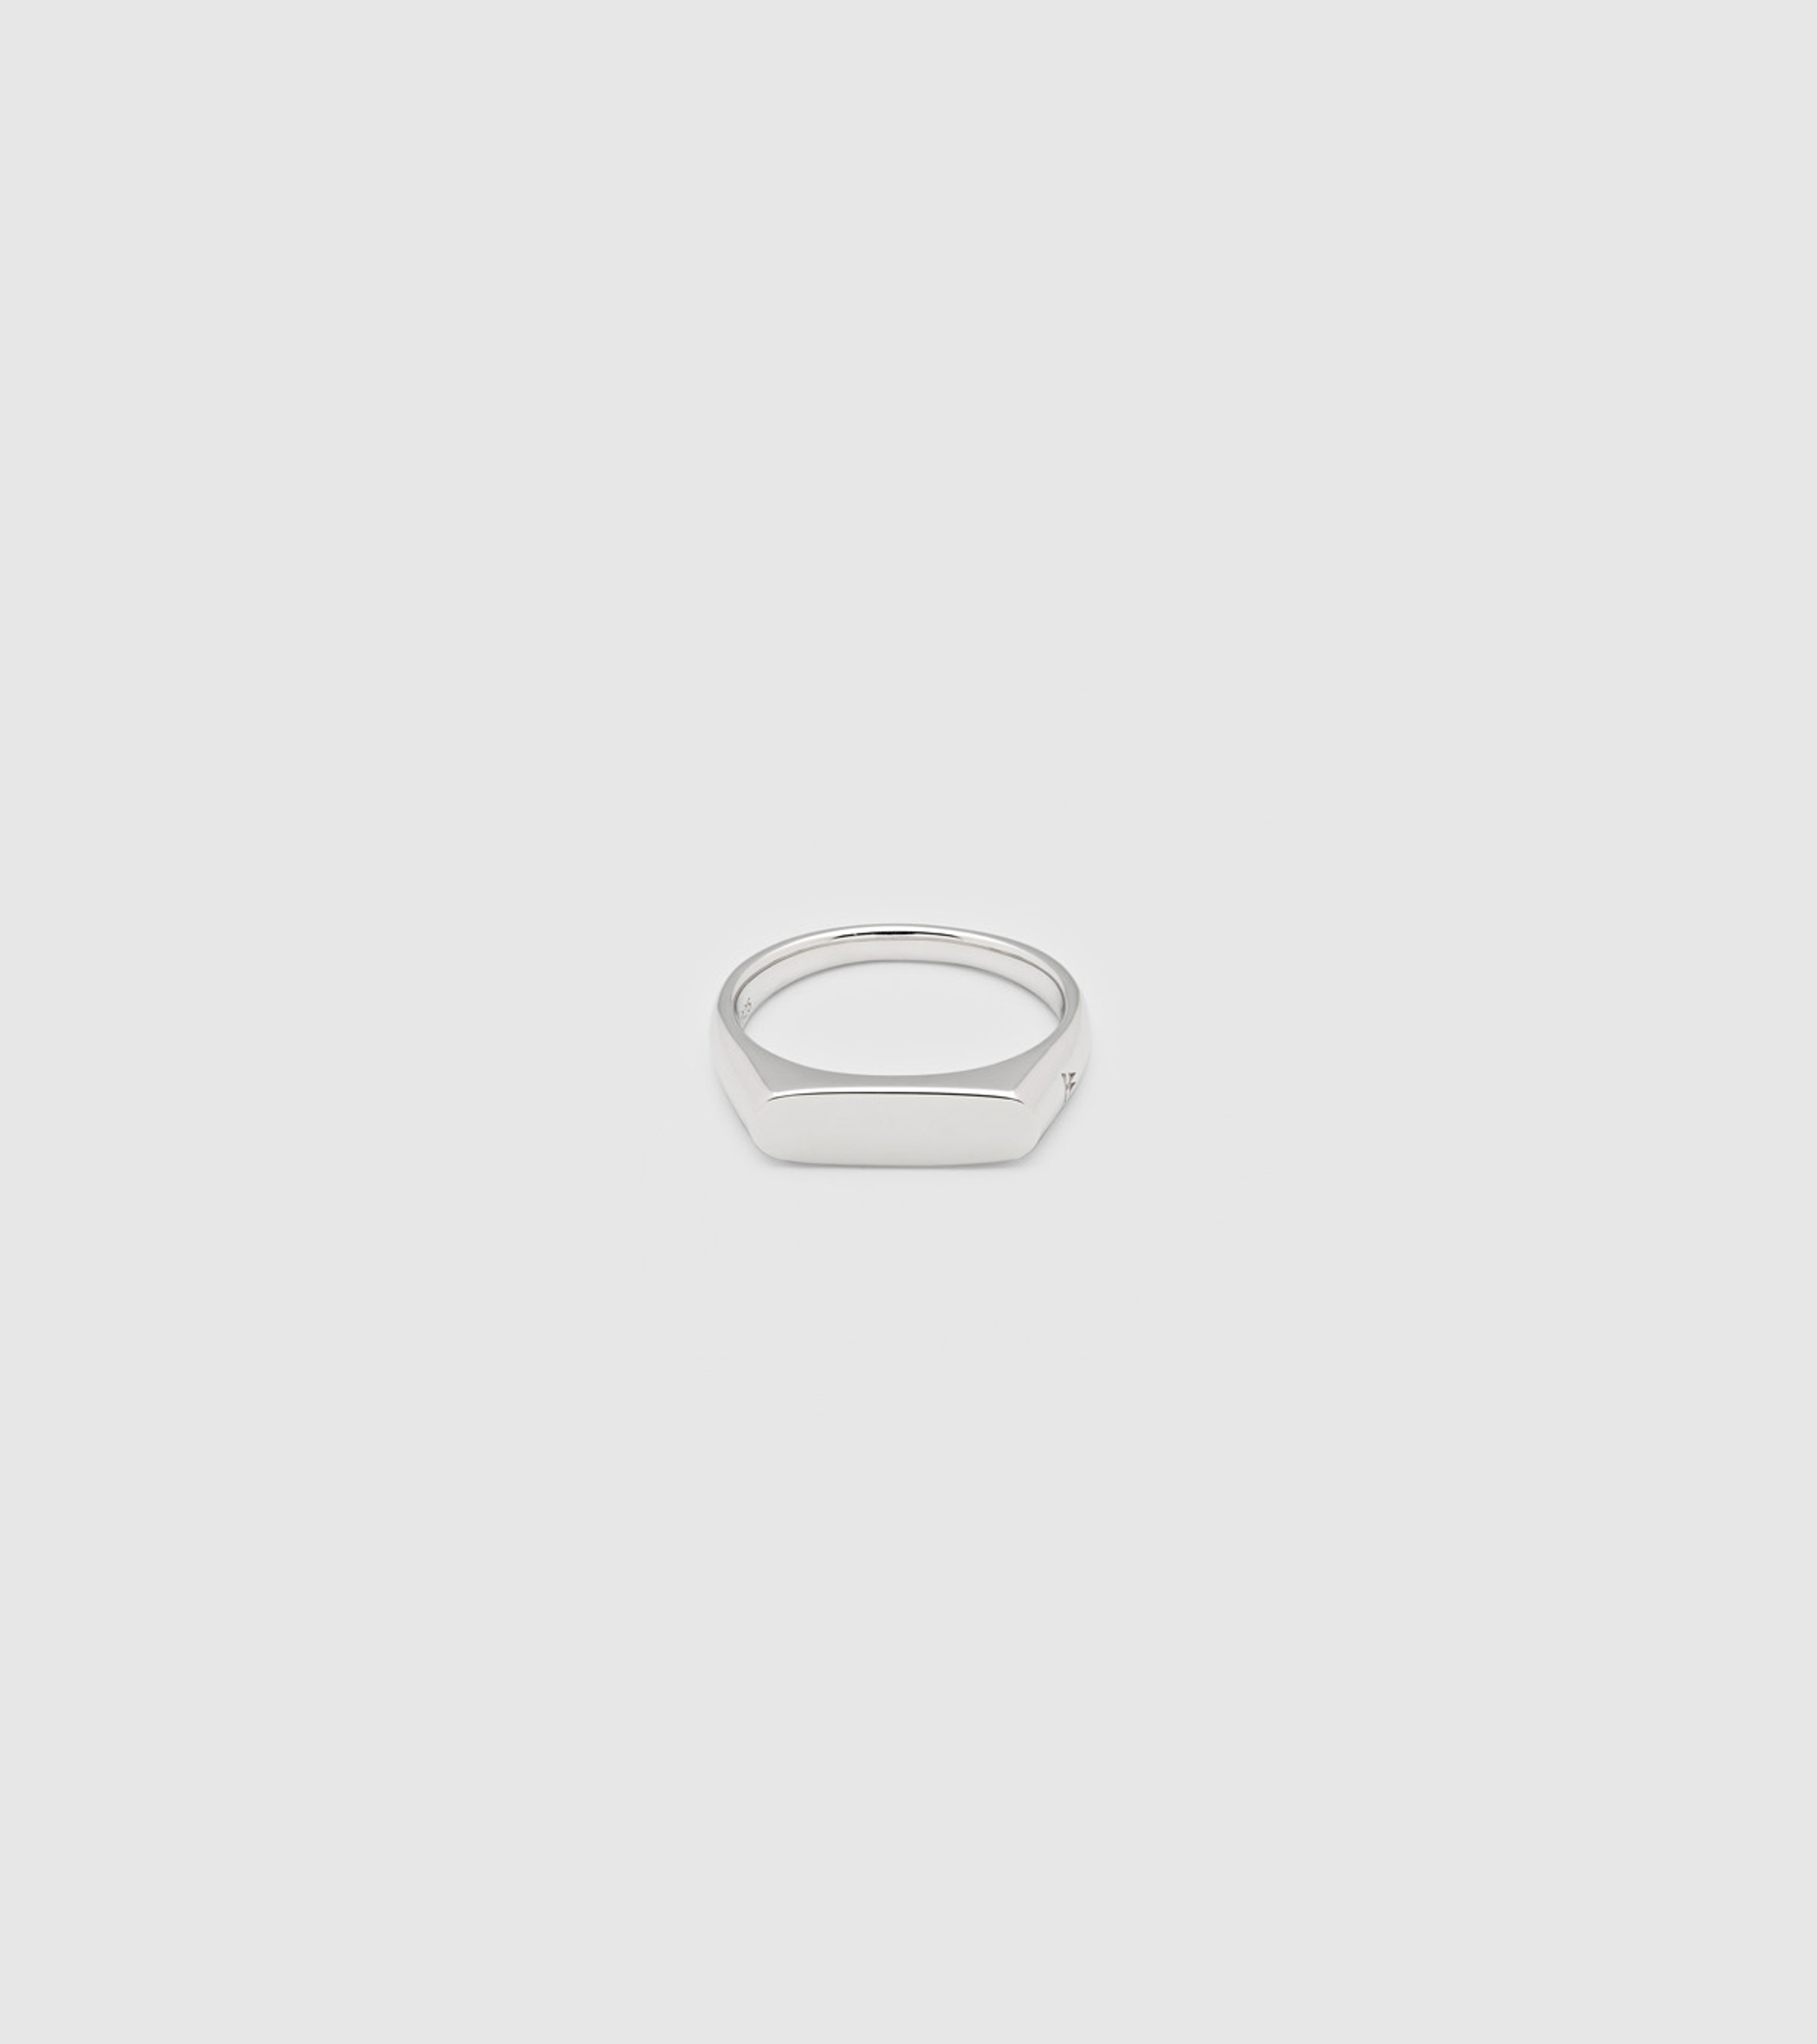 Knut Ring